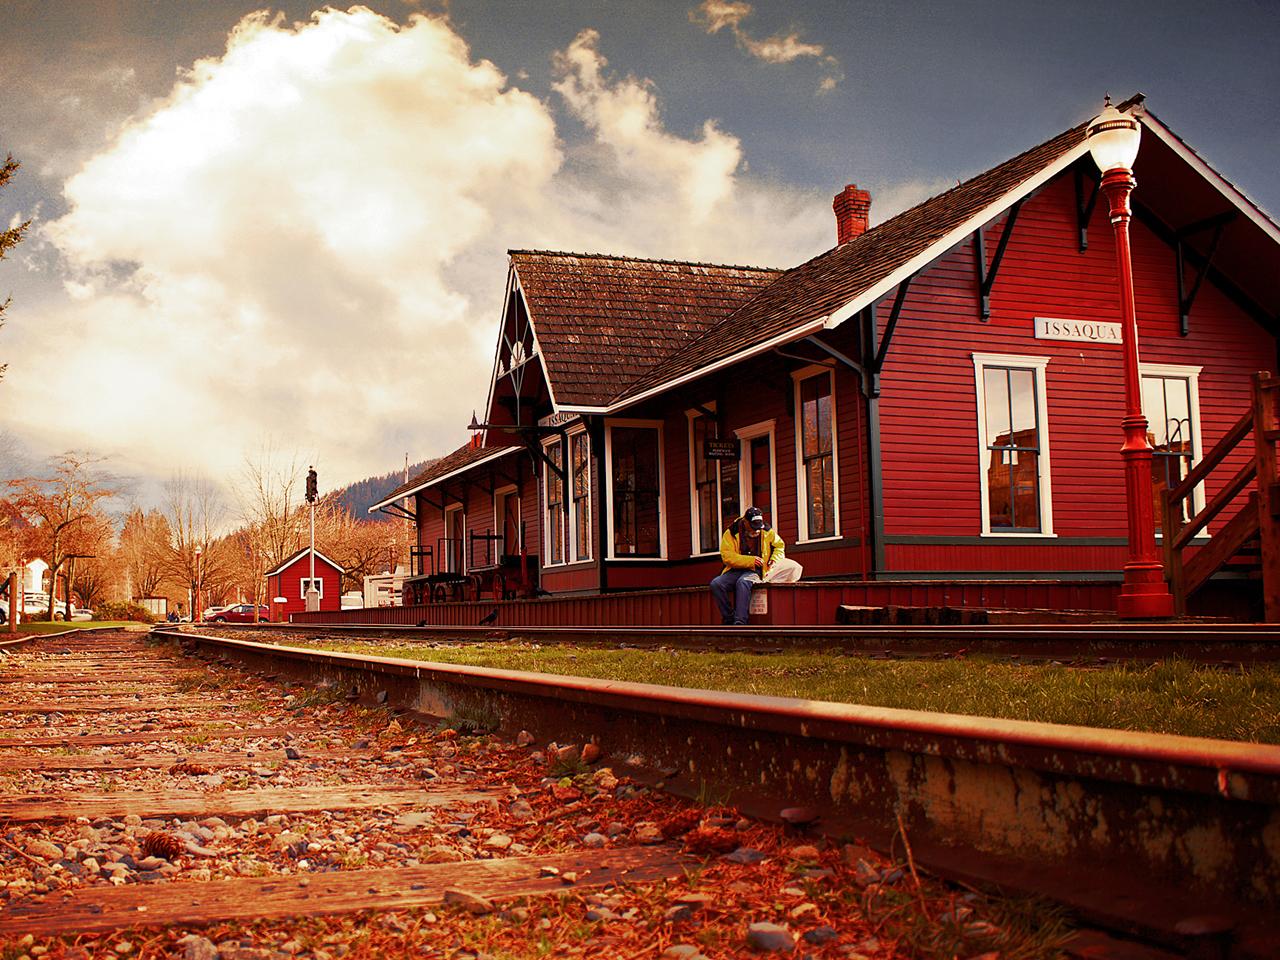 Issaquah Depot Museum